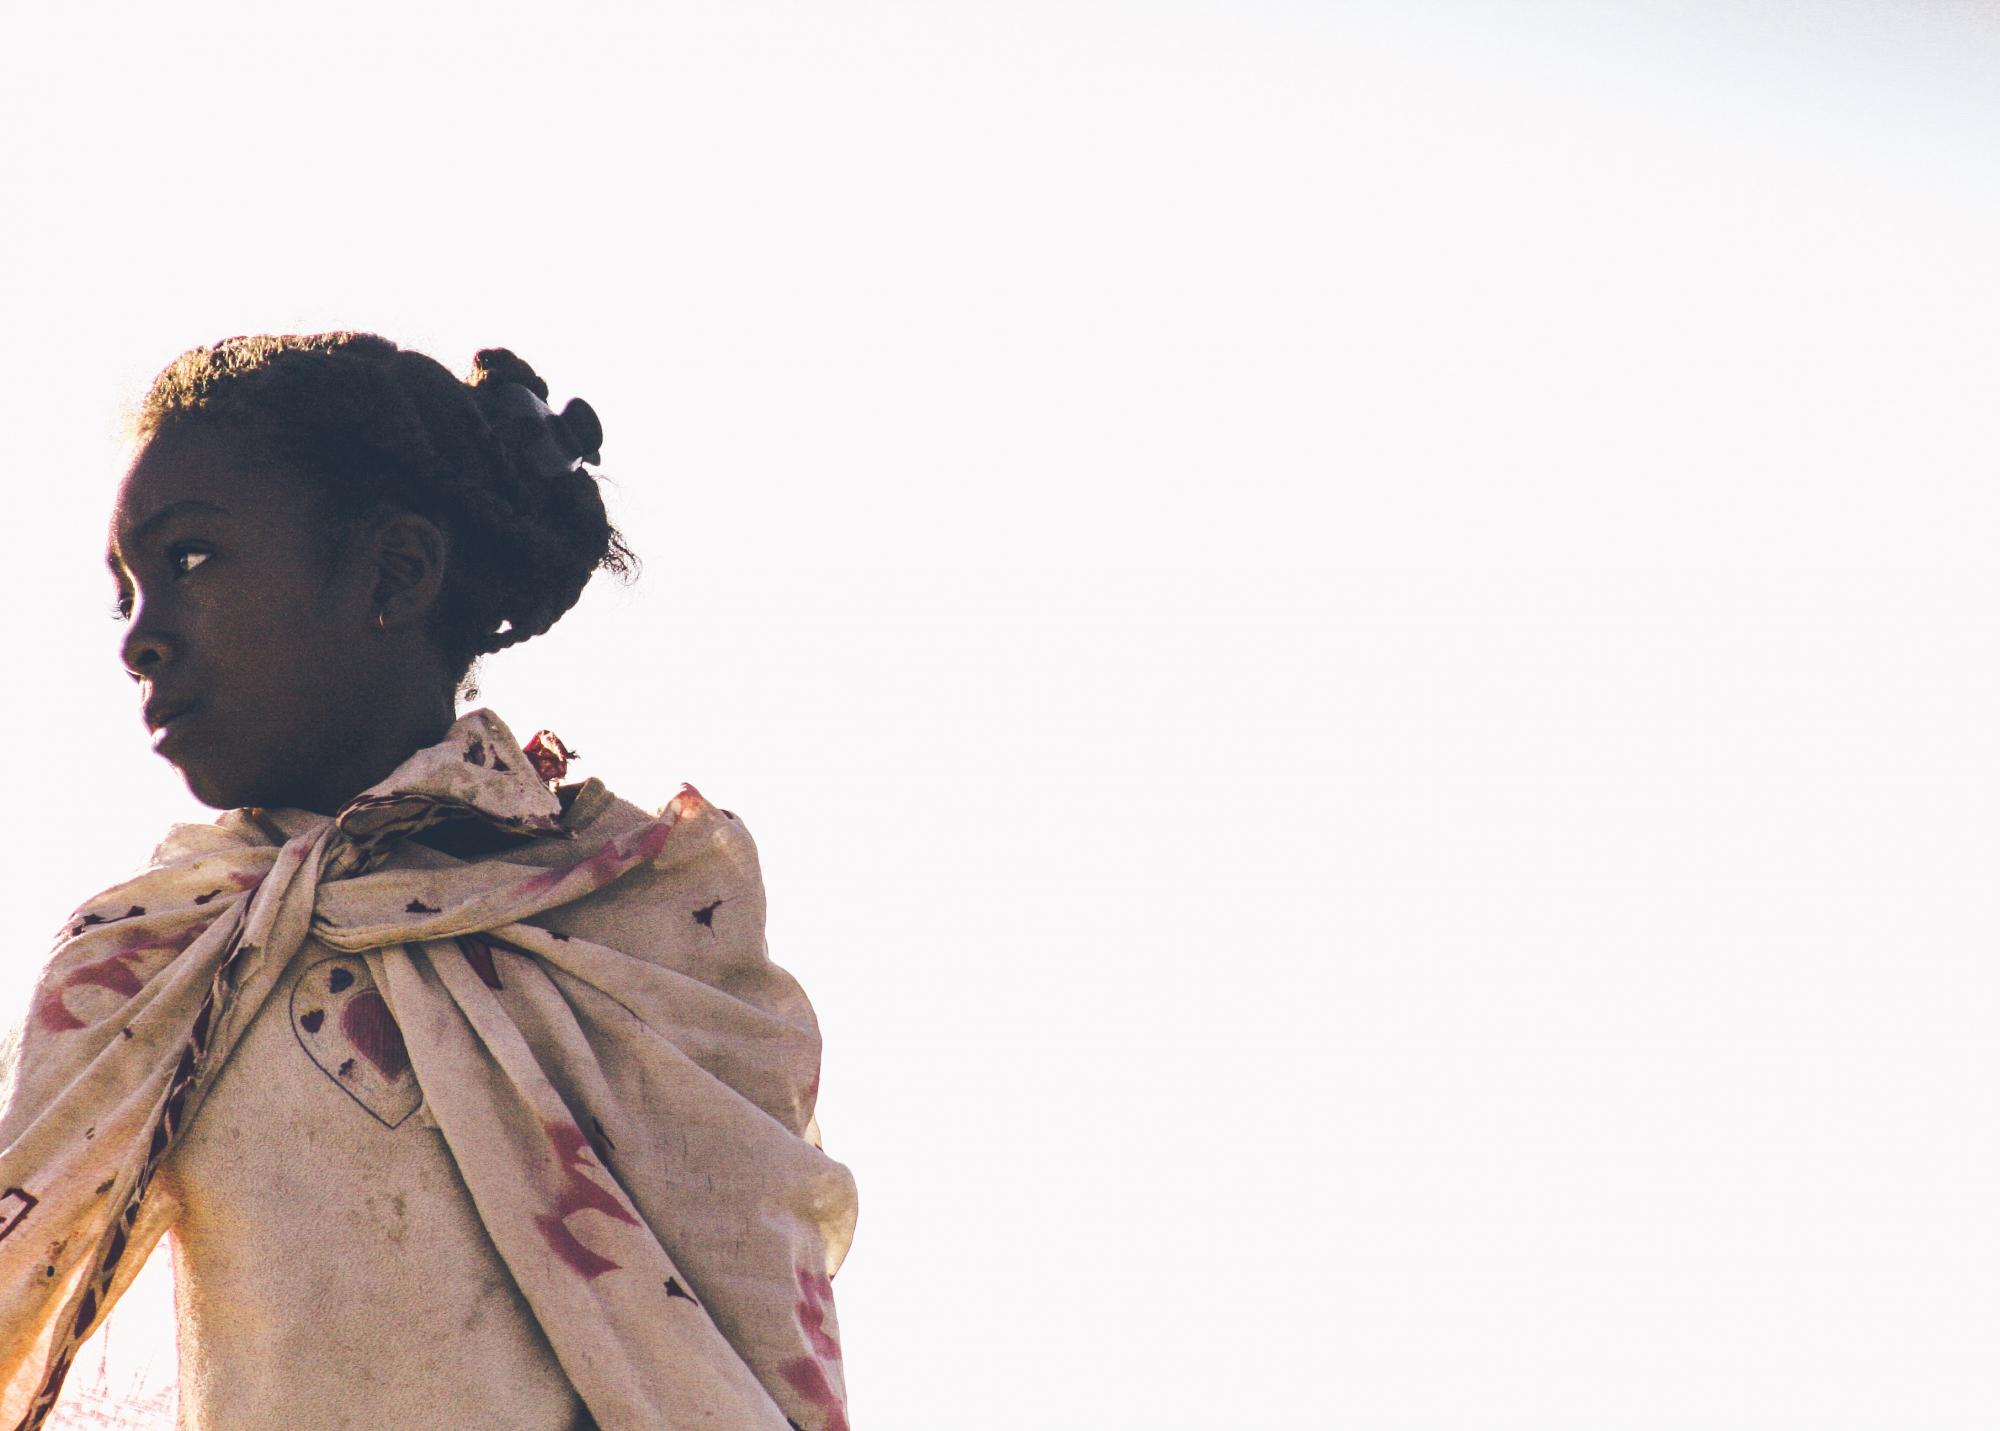 Mädchen Afrike Ban Yido on Unsplash